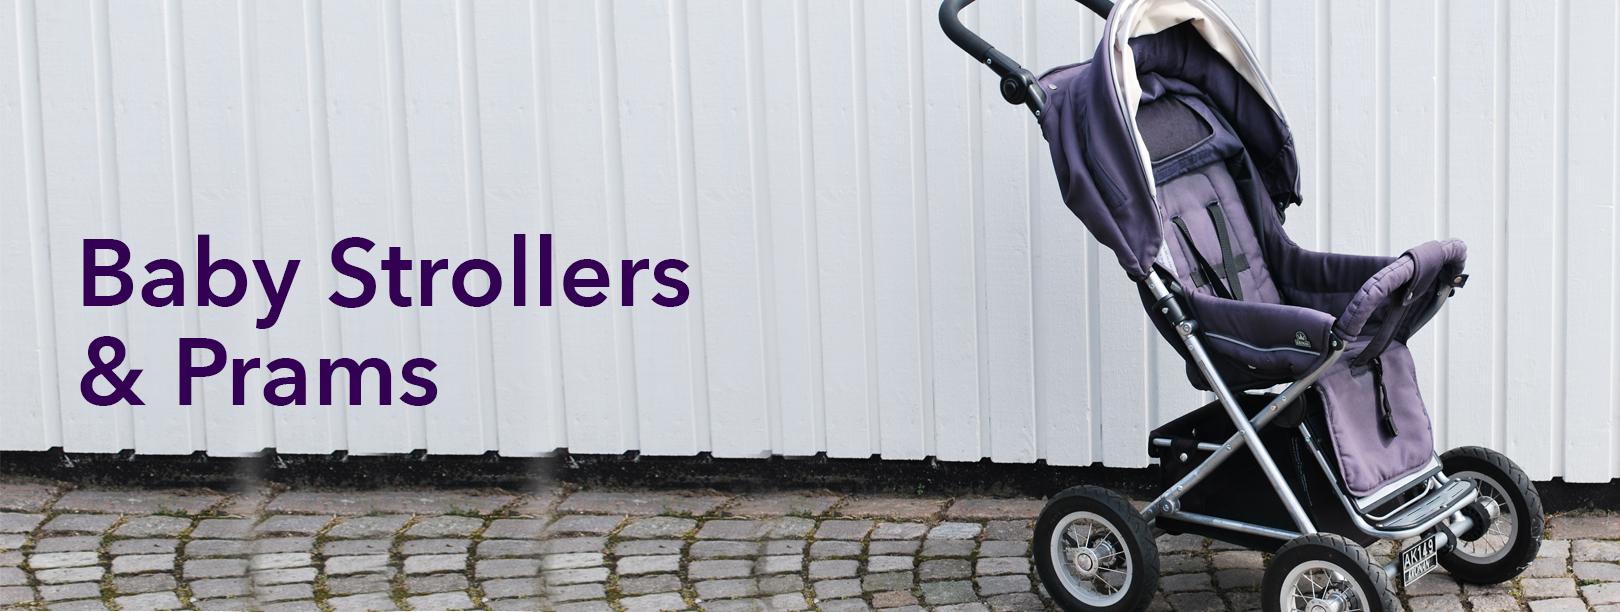 Flipkart Baby Strollers & Prams